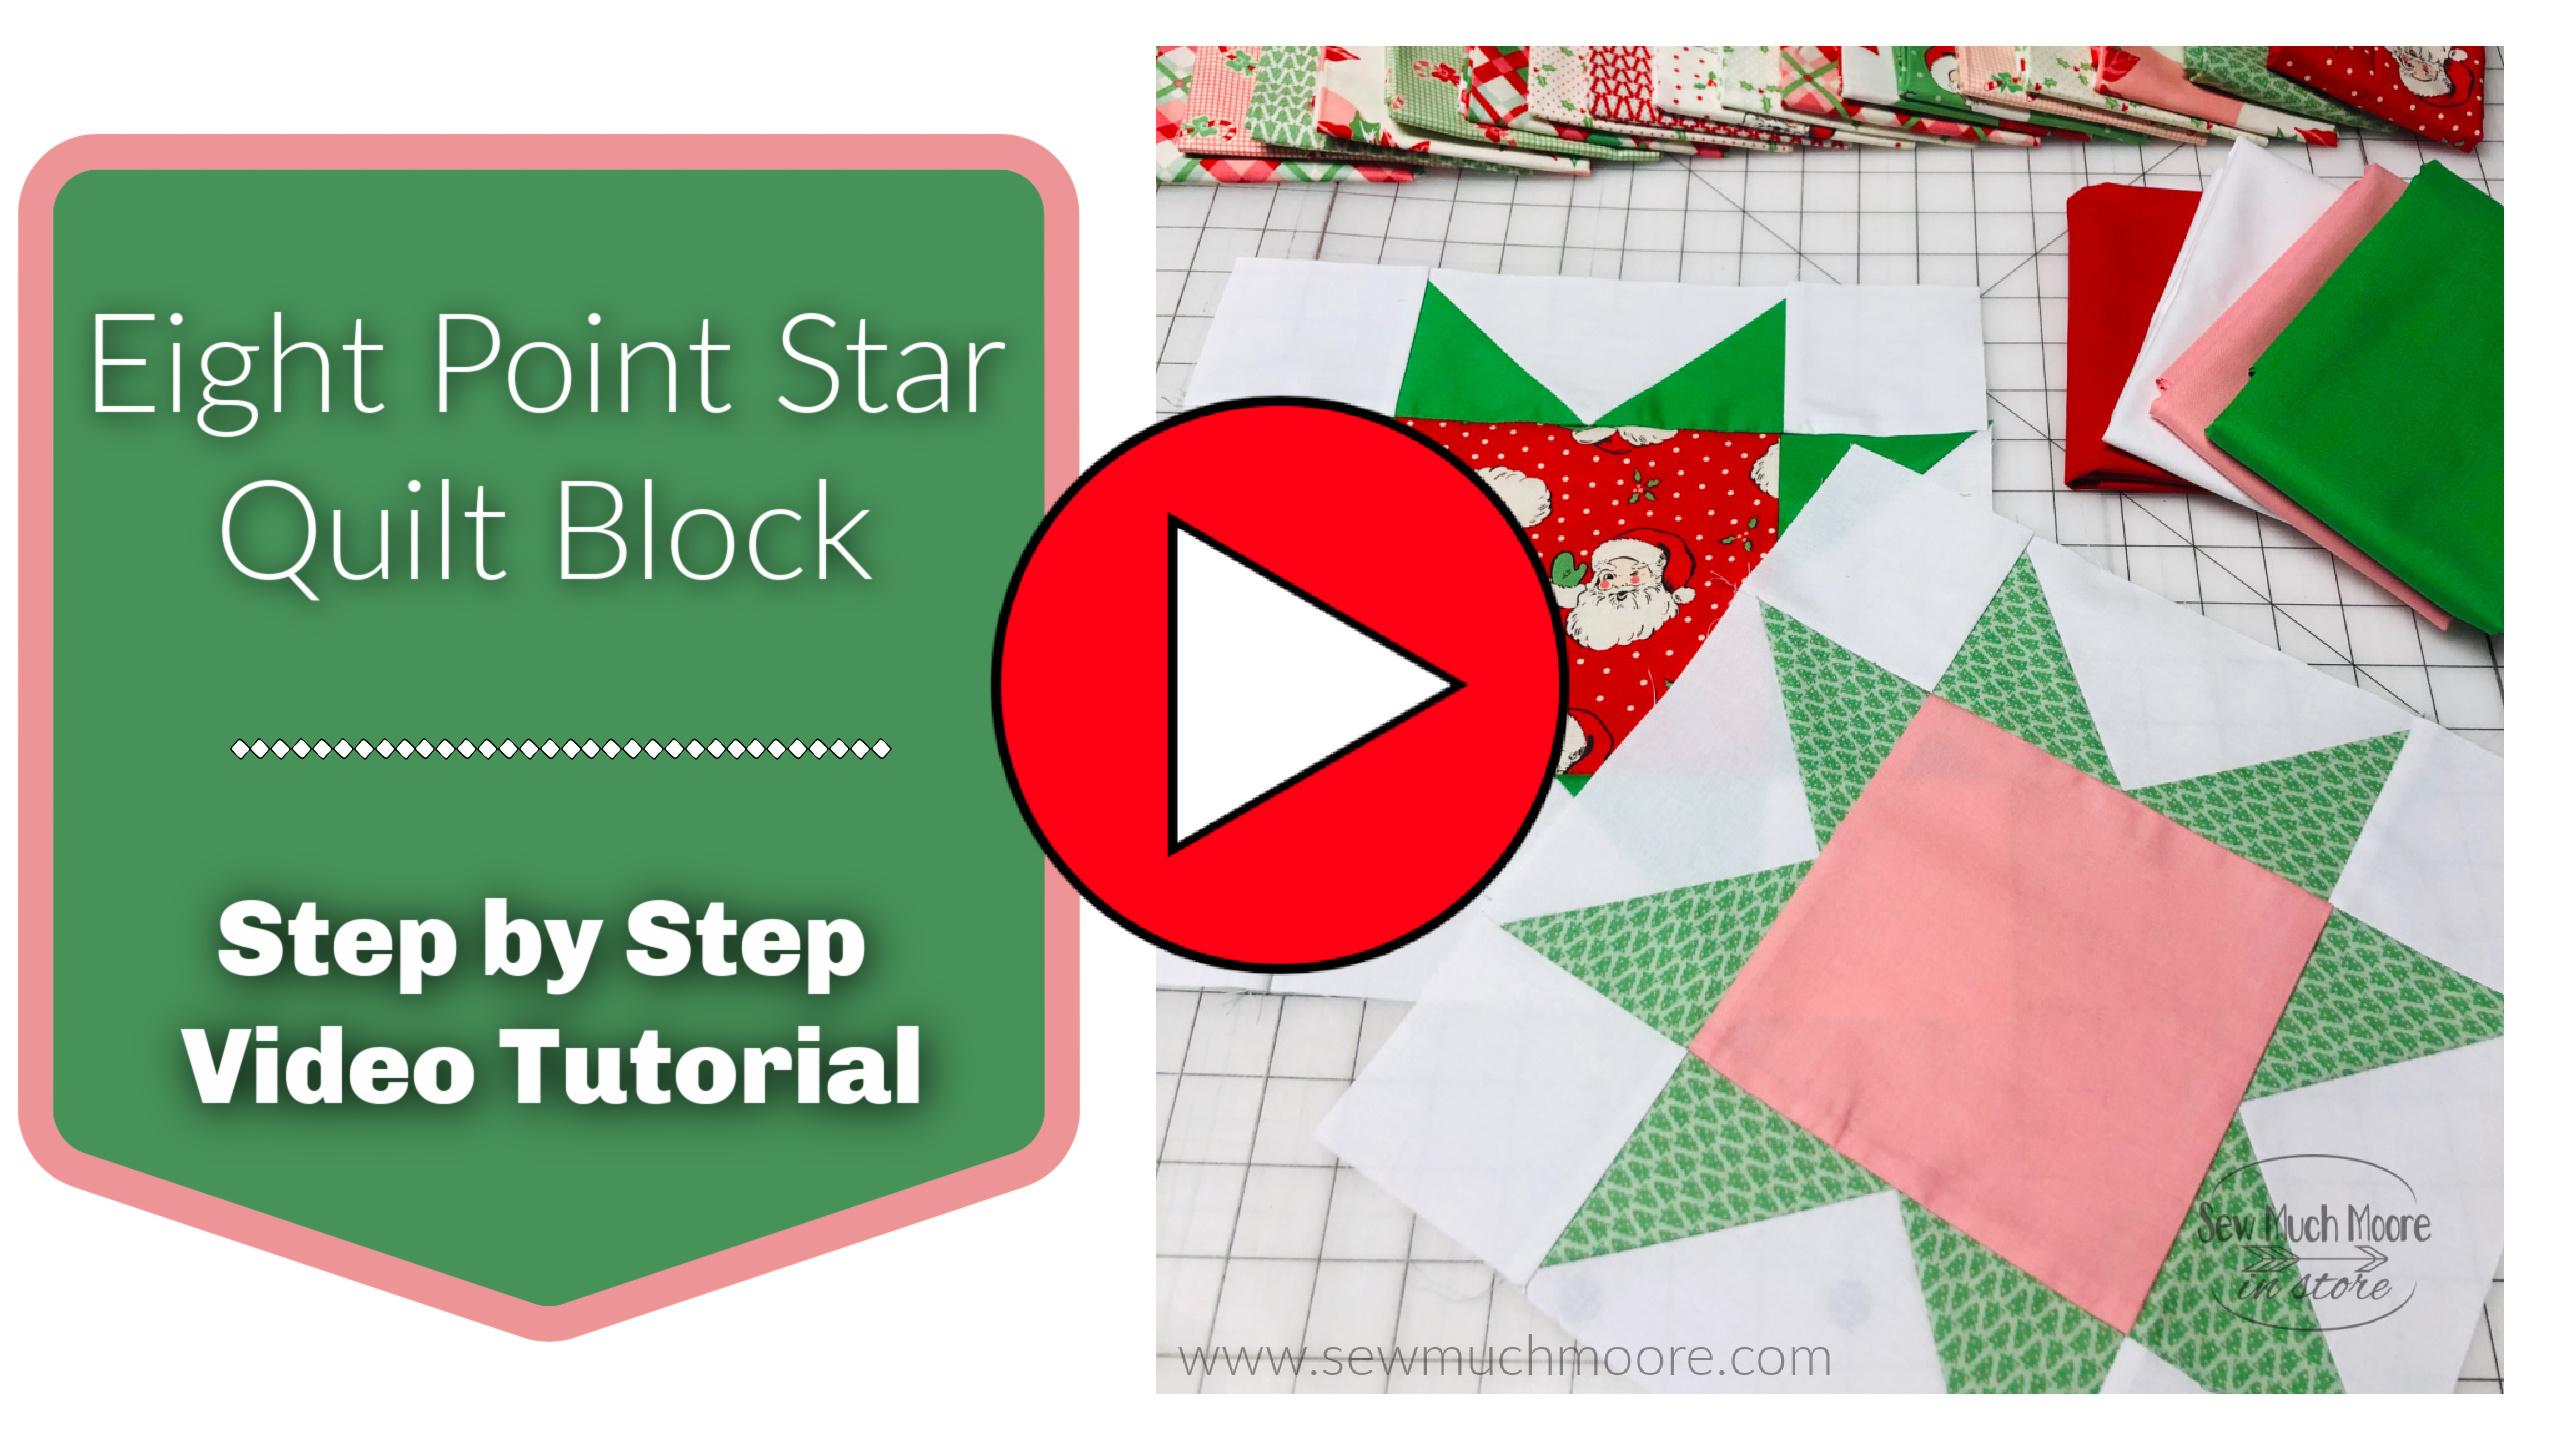 Eight Point Star Quilt Block Video Tutorial